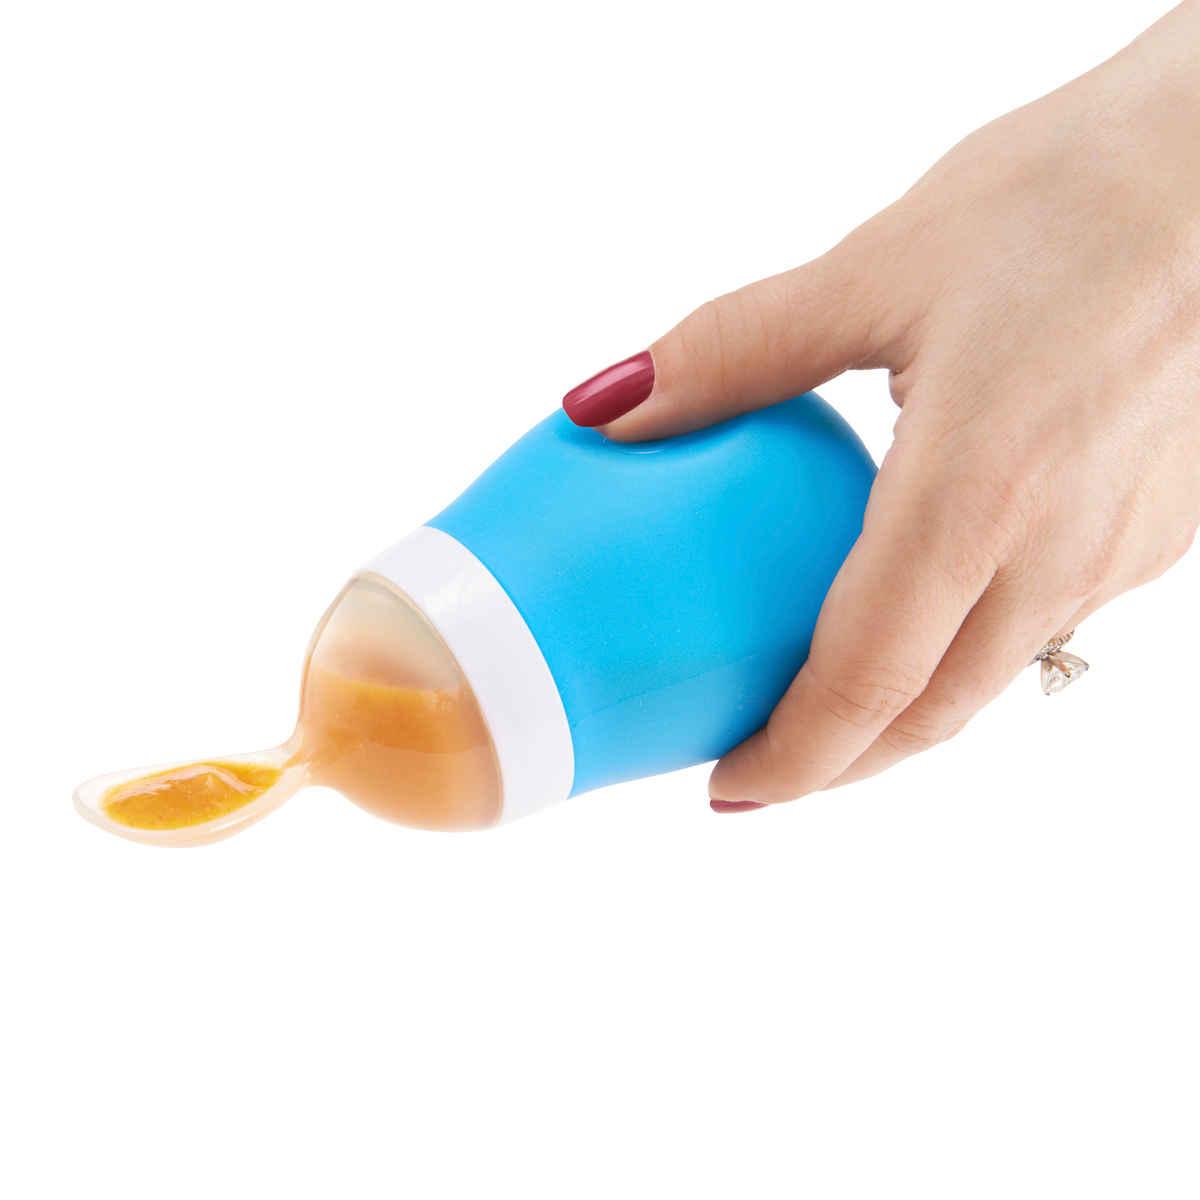 Munchkin Squeeze Spoon - Blue - image 2 de 3